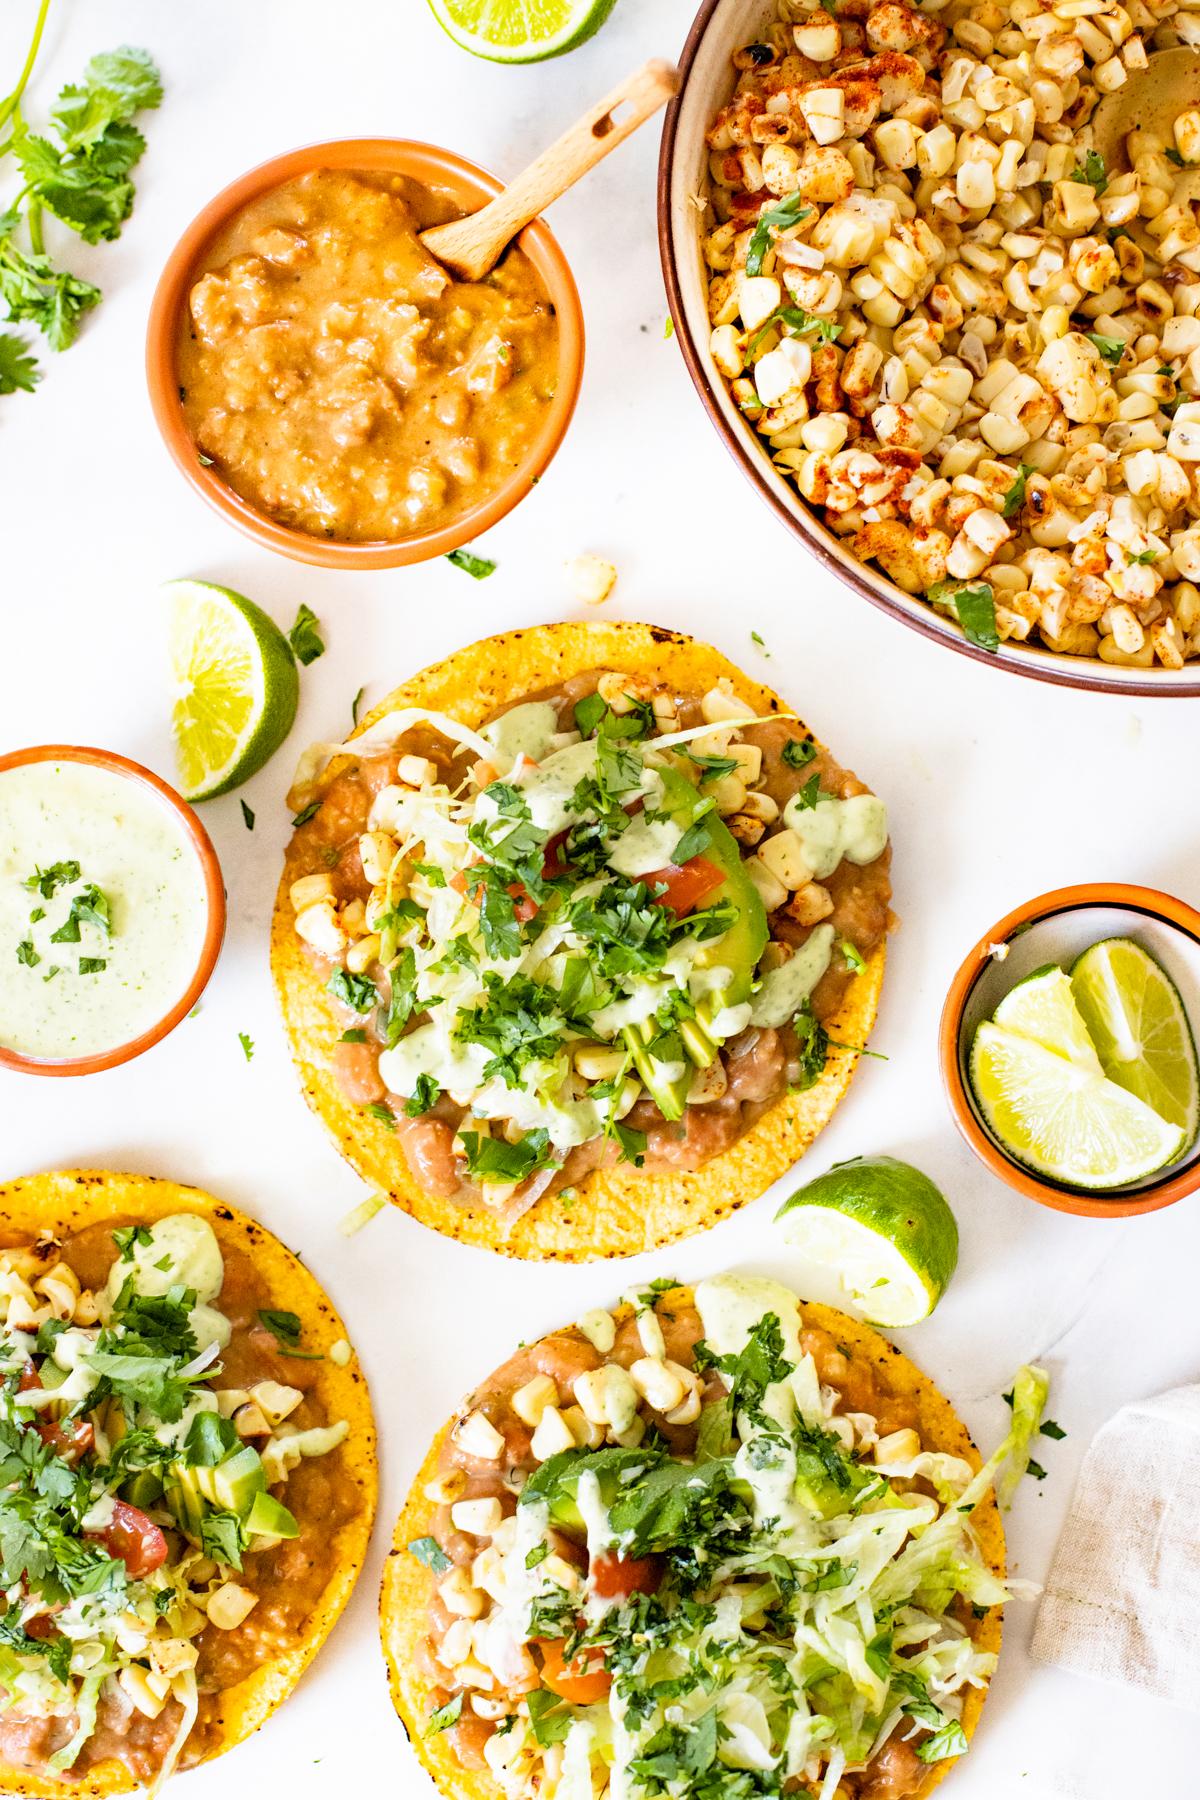 These Vegan Grilled Corn Tostadas are loaded with refried beans, charred corn and a creamy habanero sauce   ThisSavoryVegan.com #thissavoryvegan #vegandinnerideas #vegantostadas